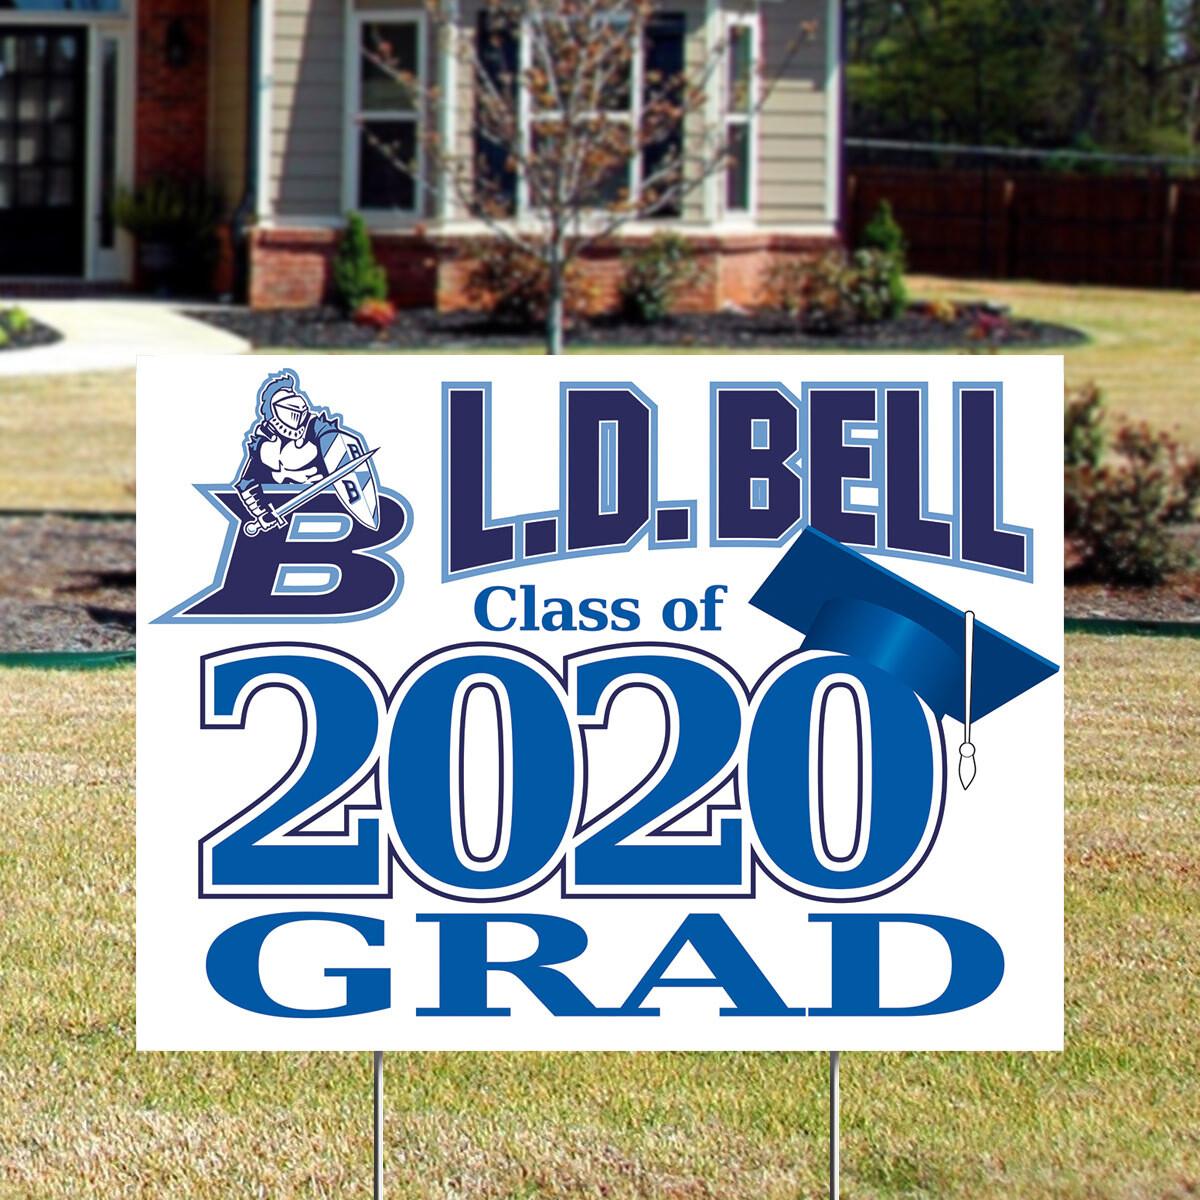 L.D. Bell High School (4 styles)